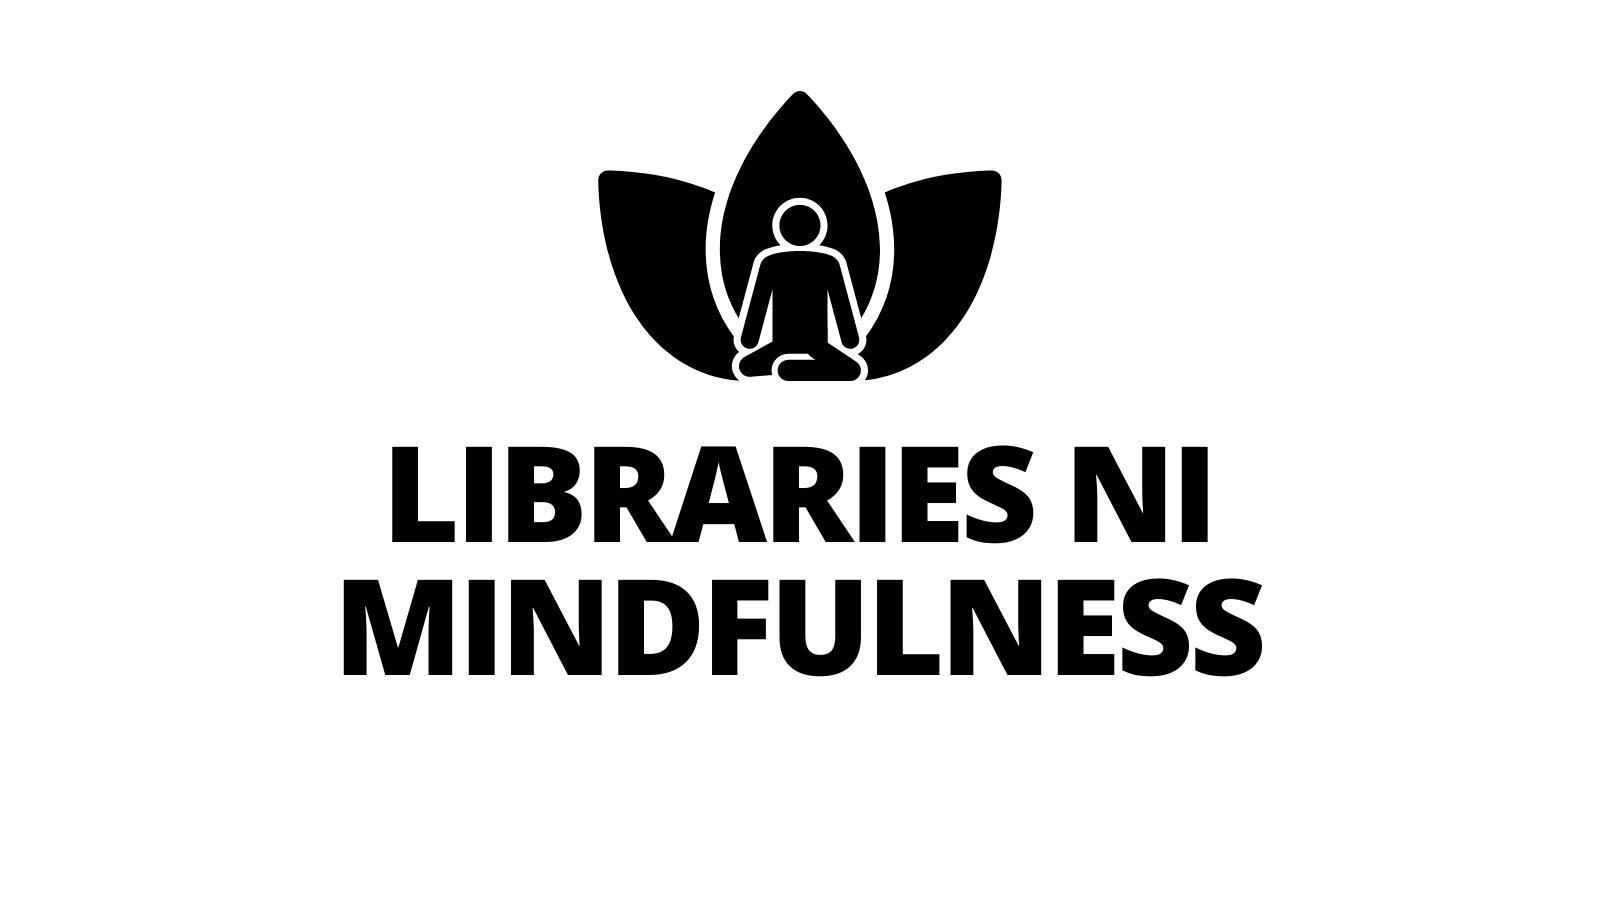 Libraries NI Mindfulness